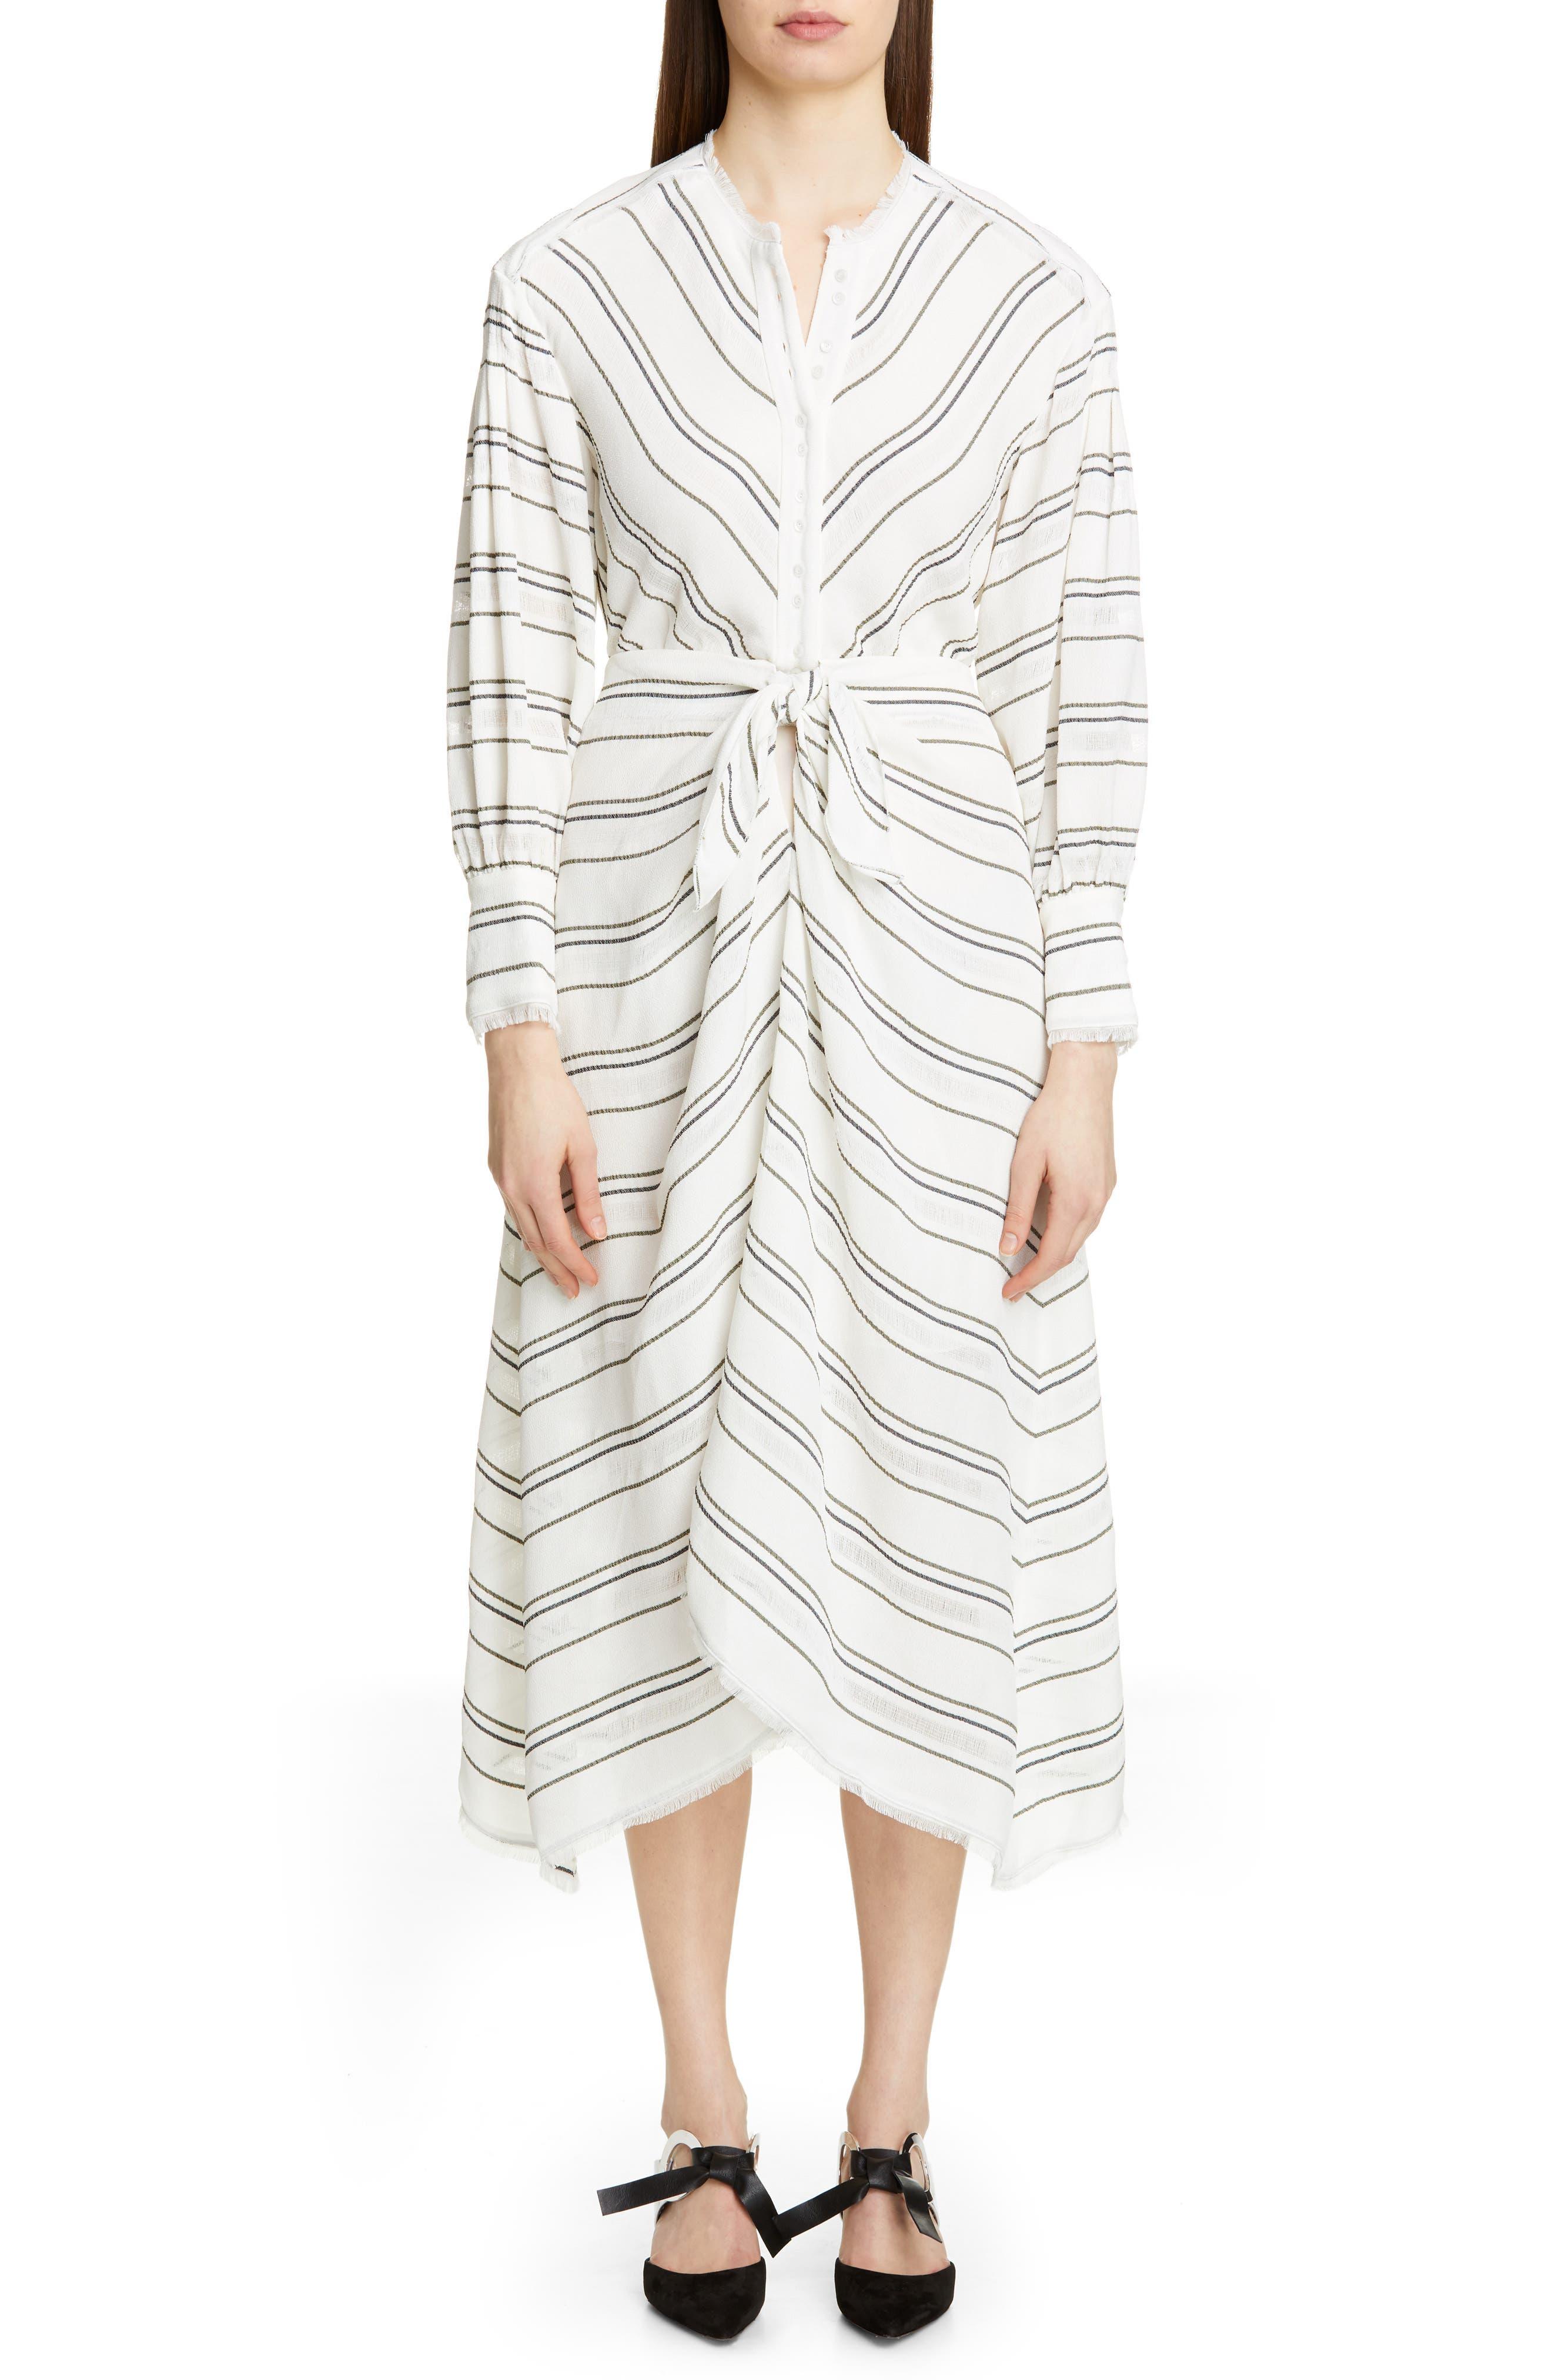 PROENZA SCHOULER Tie Front Stripe Crepe Dress, Main, color, WHITE